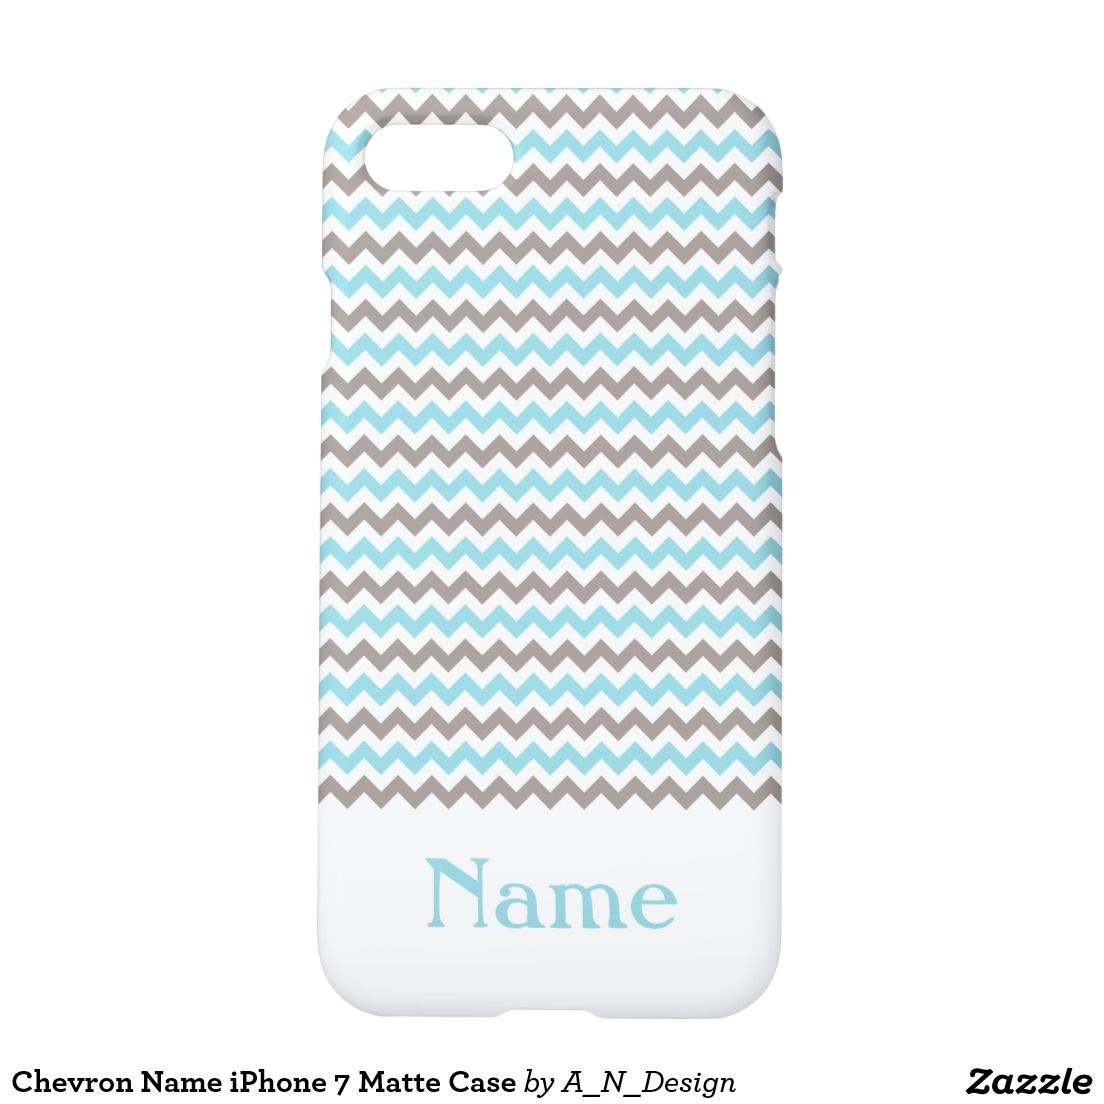 Chevron Name iPhone 7 Matte Case Zazzle